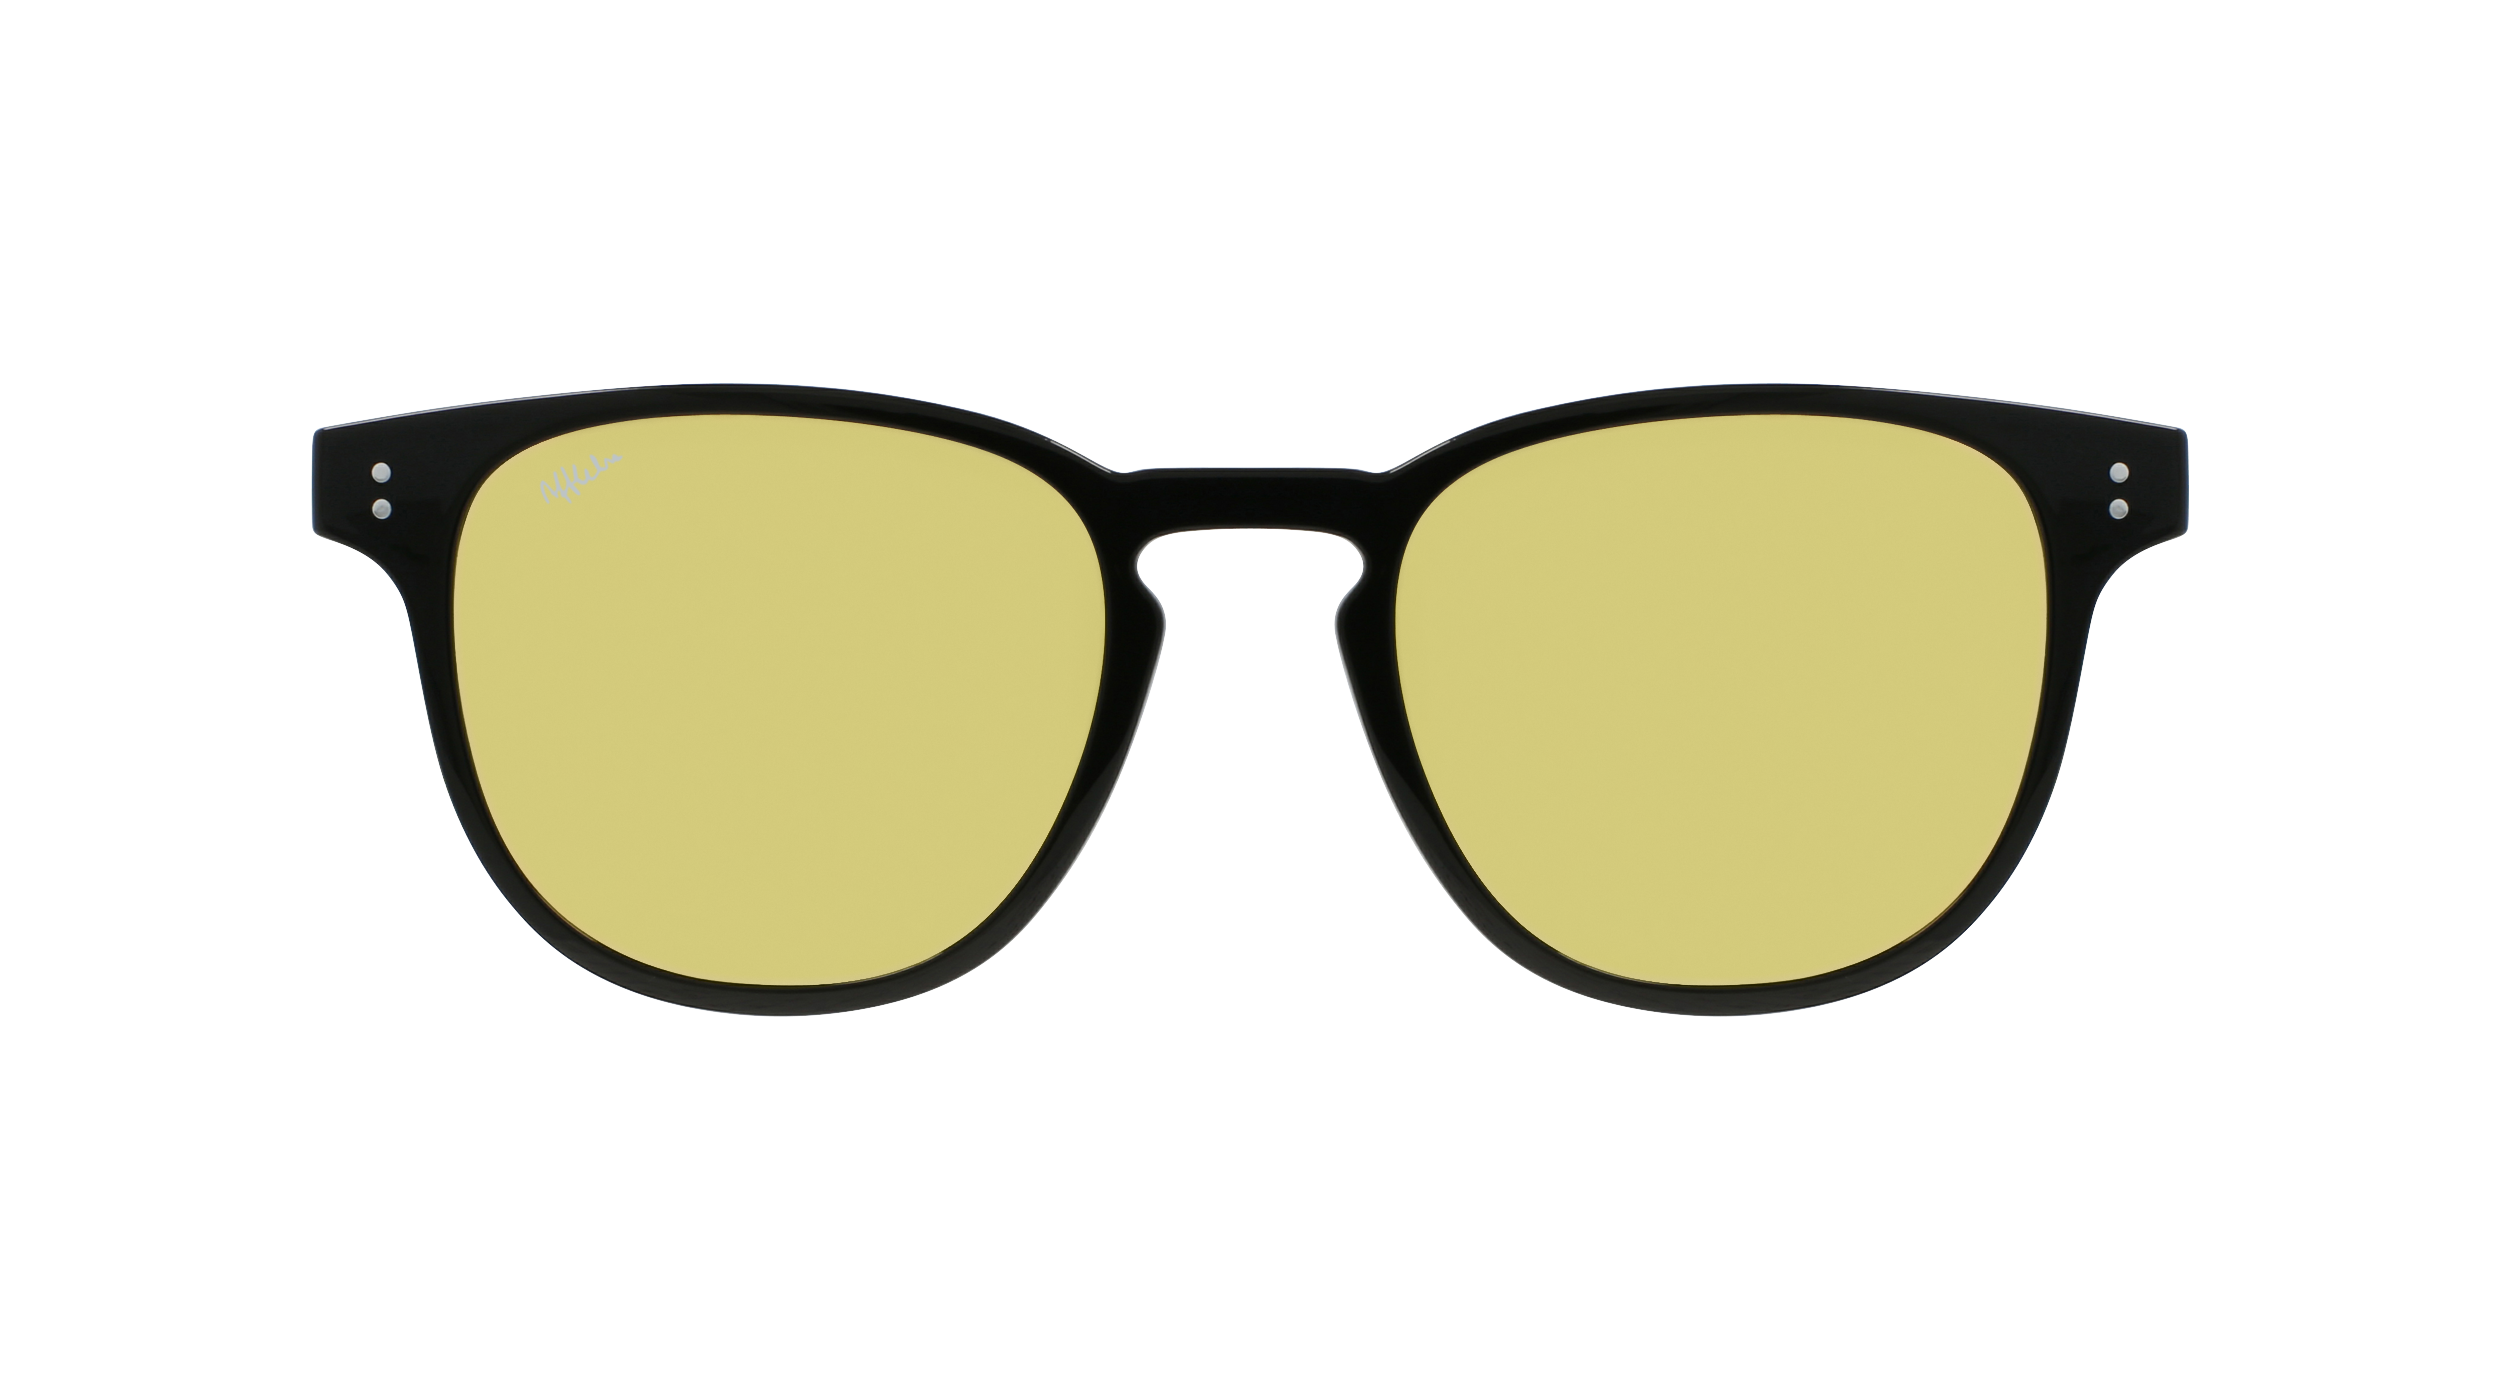 afflelou/france/products/smart_clip/clips_glasses/07630036436936.png